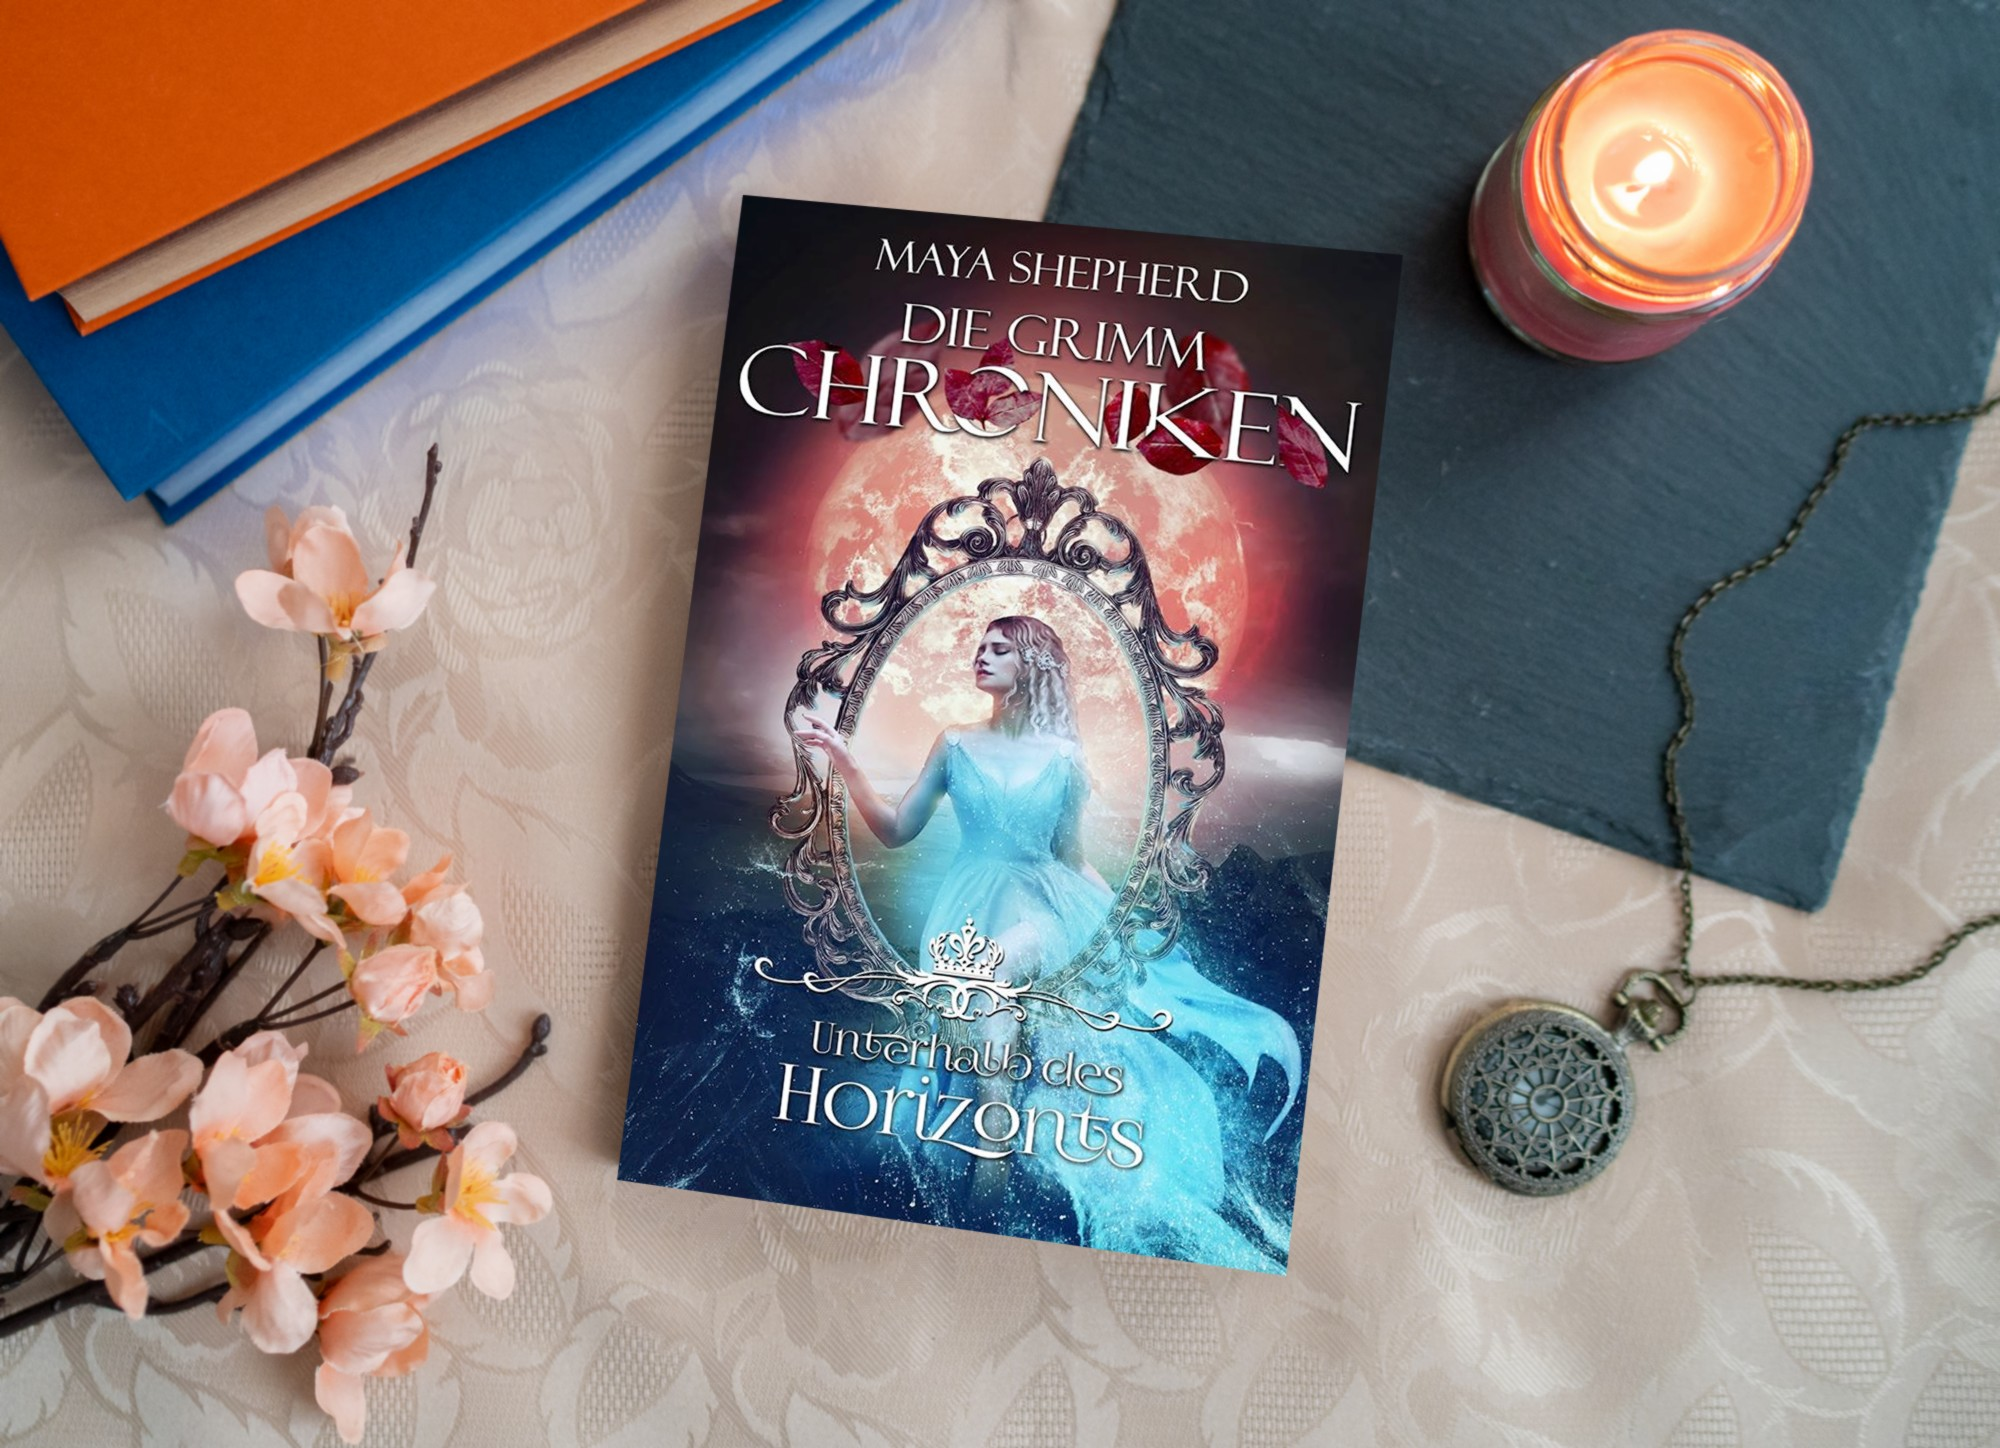 Die Grimm-Chroniken: Unterhalb des Horizonts – Maya Shepherd graphic